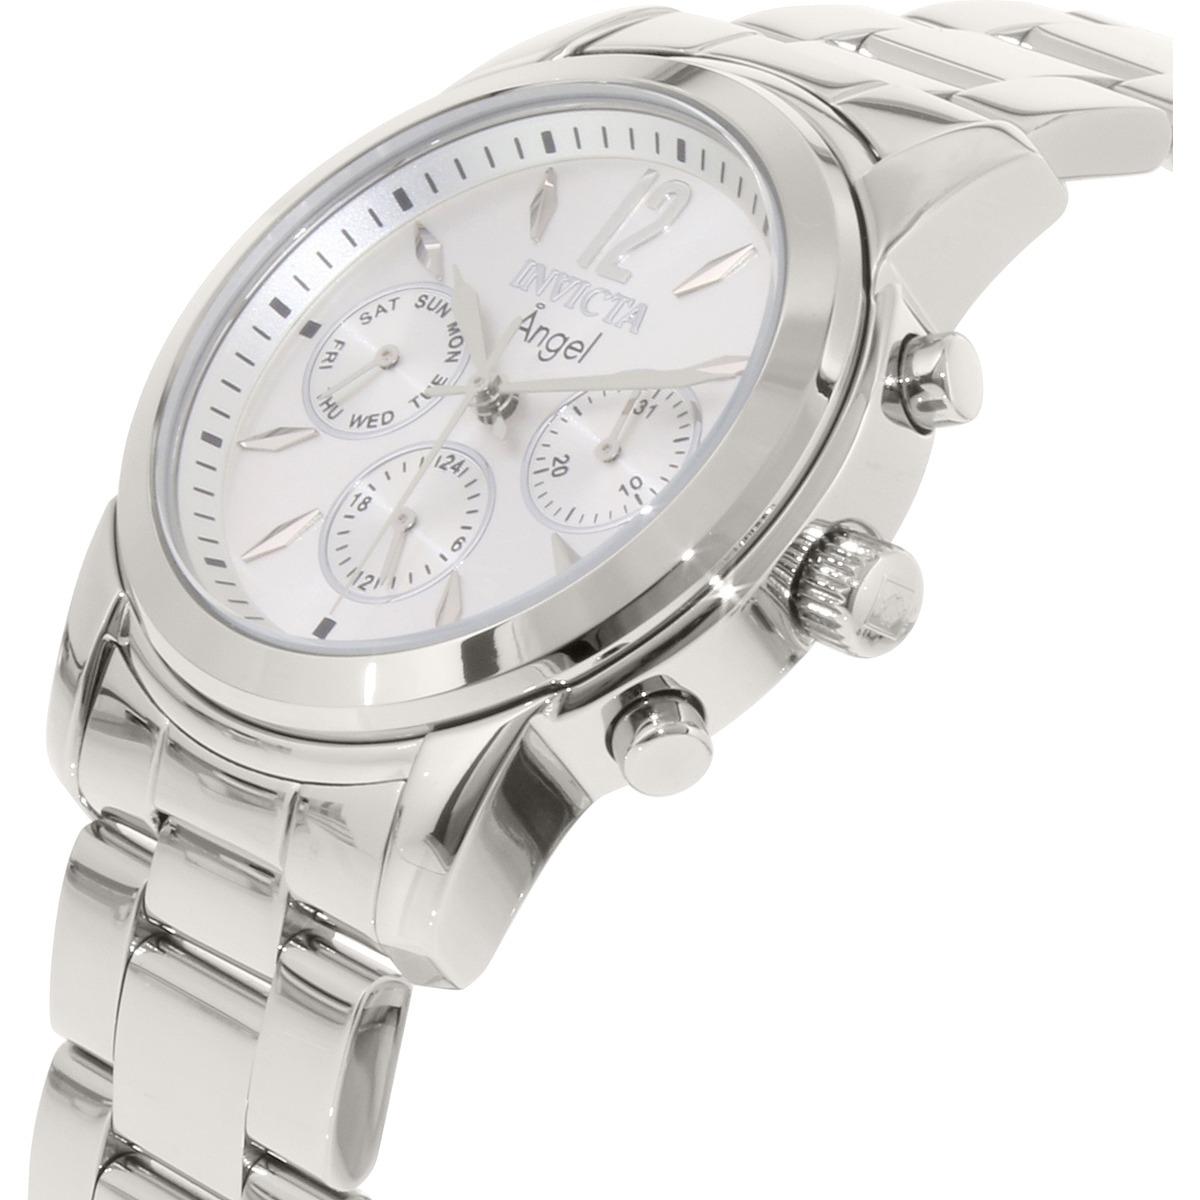 Reloj Invicta Angel 0461 Suizo Acero Inoxidable Para Mujer -   7.949 ... ecdc76307f4b